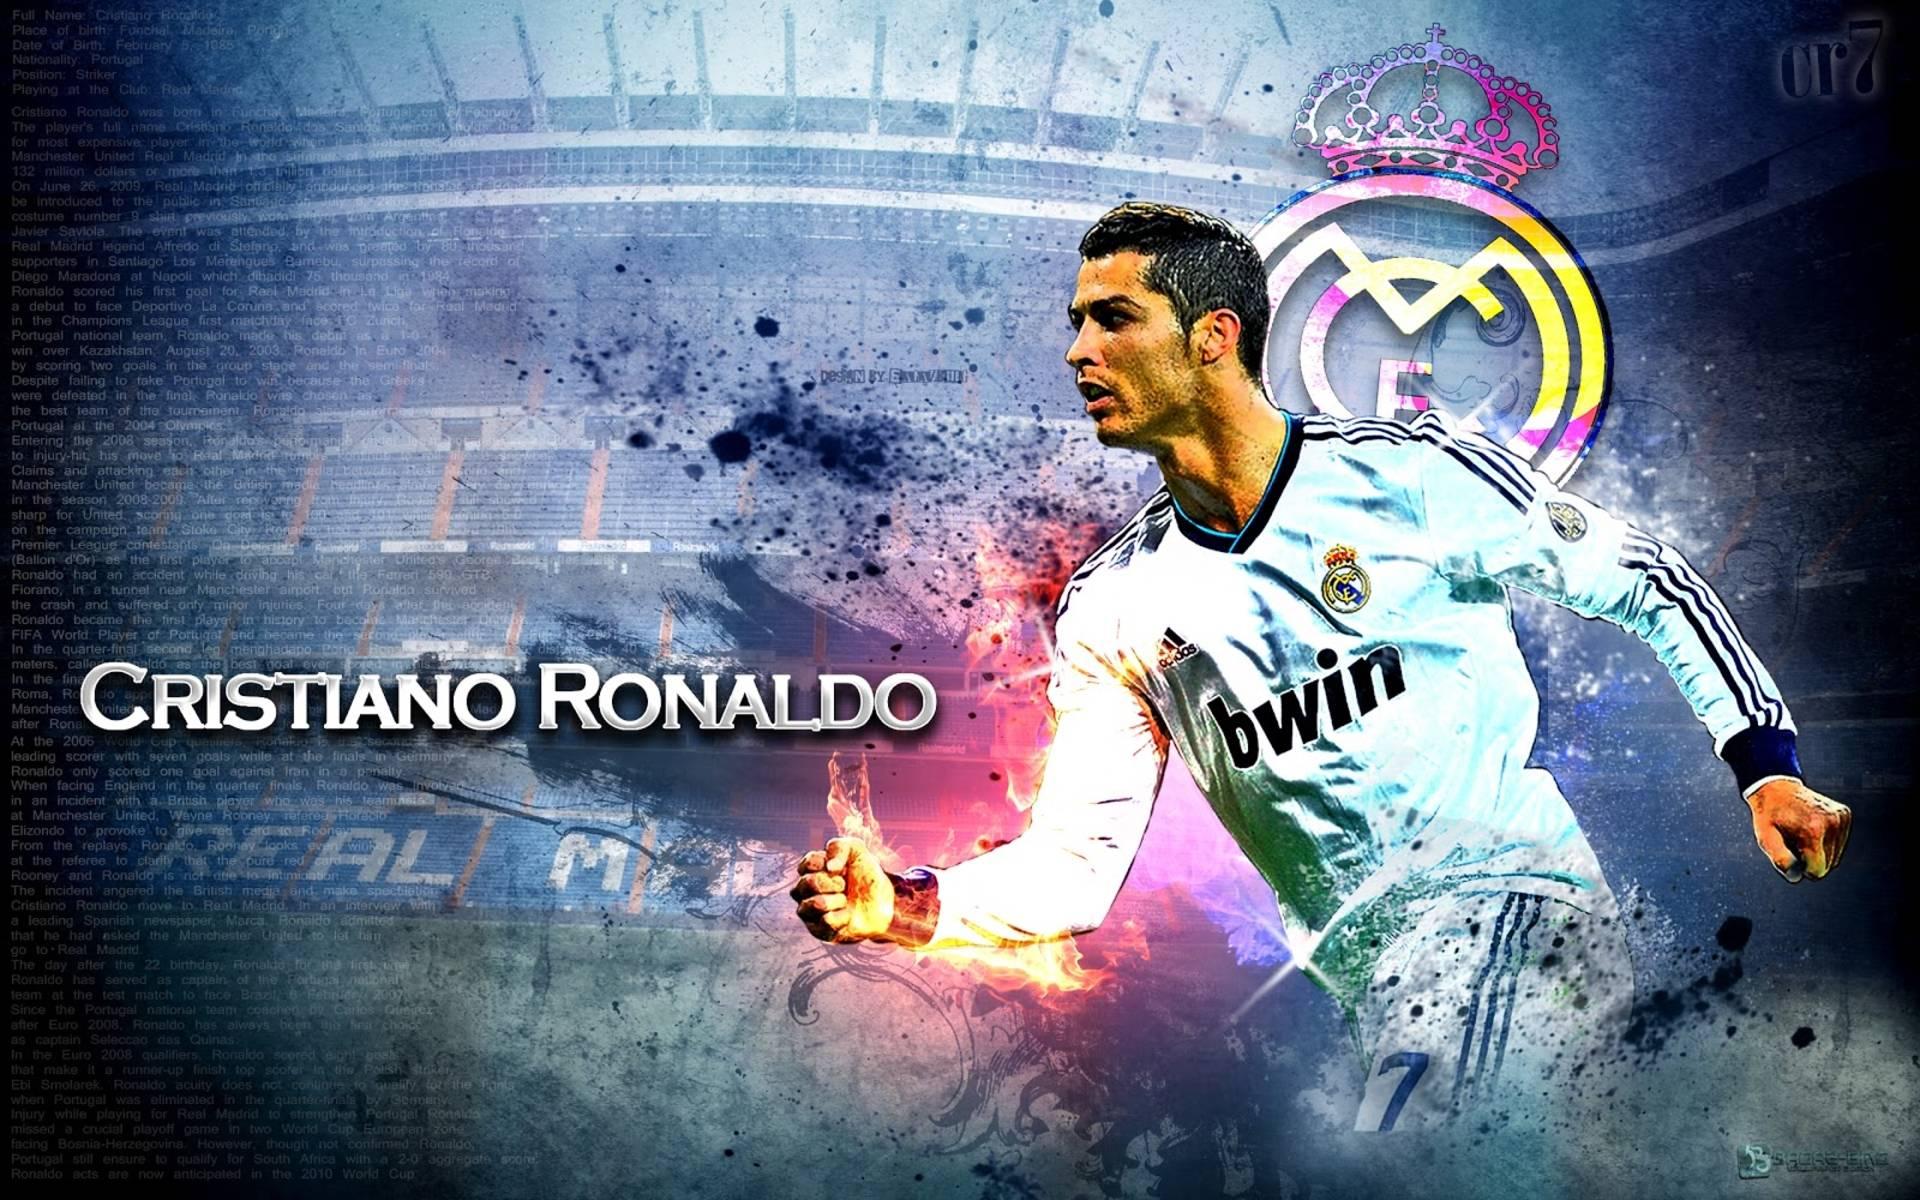 Cristiano Ronaldo Wallpapers HD - Wallpaper Cave